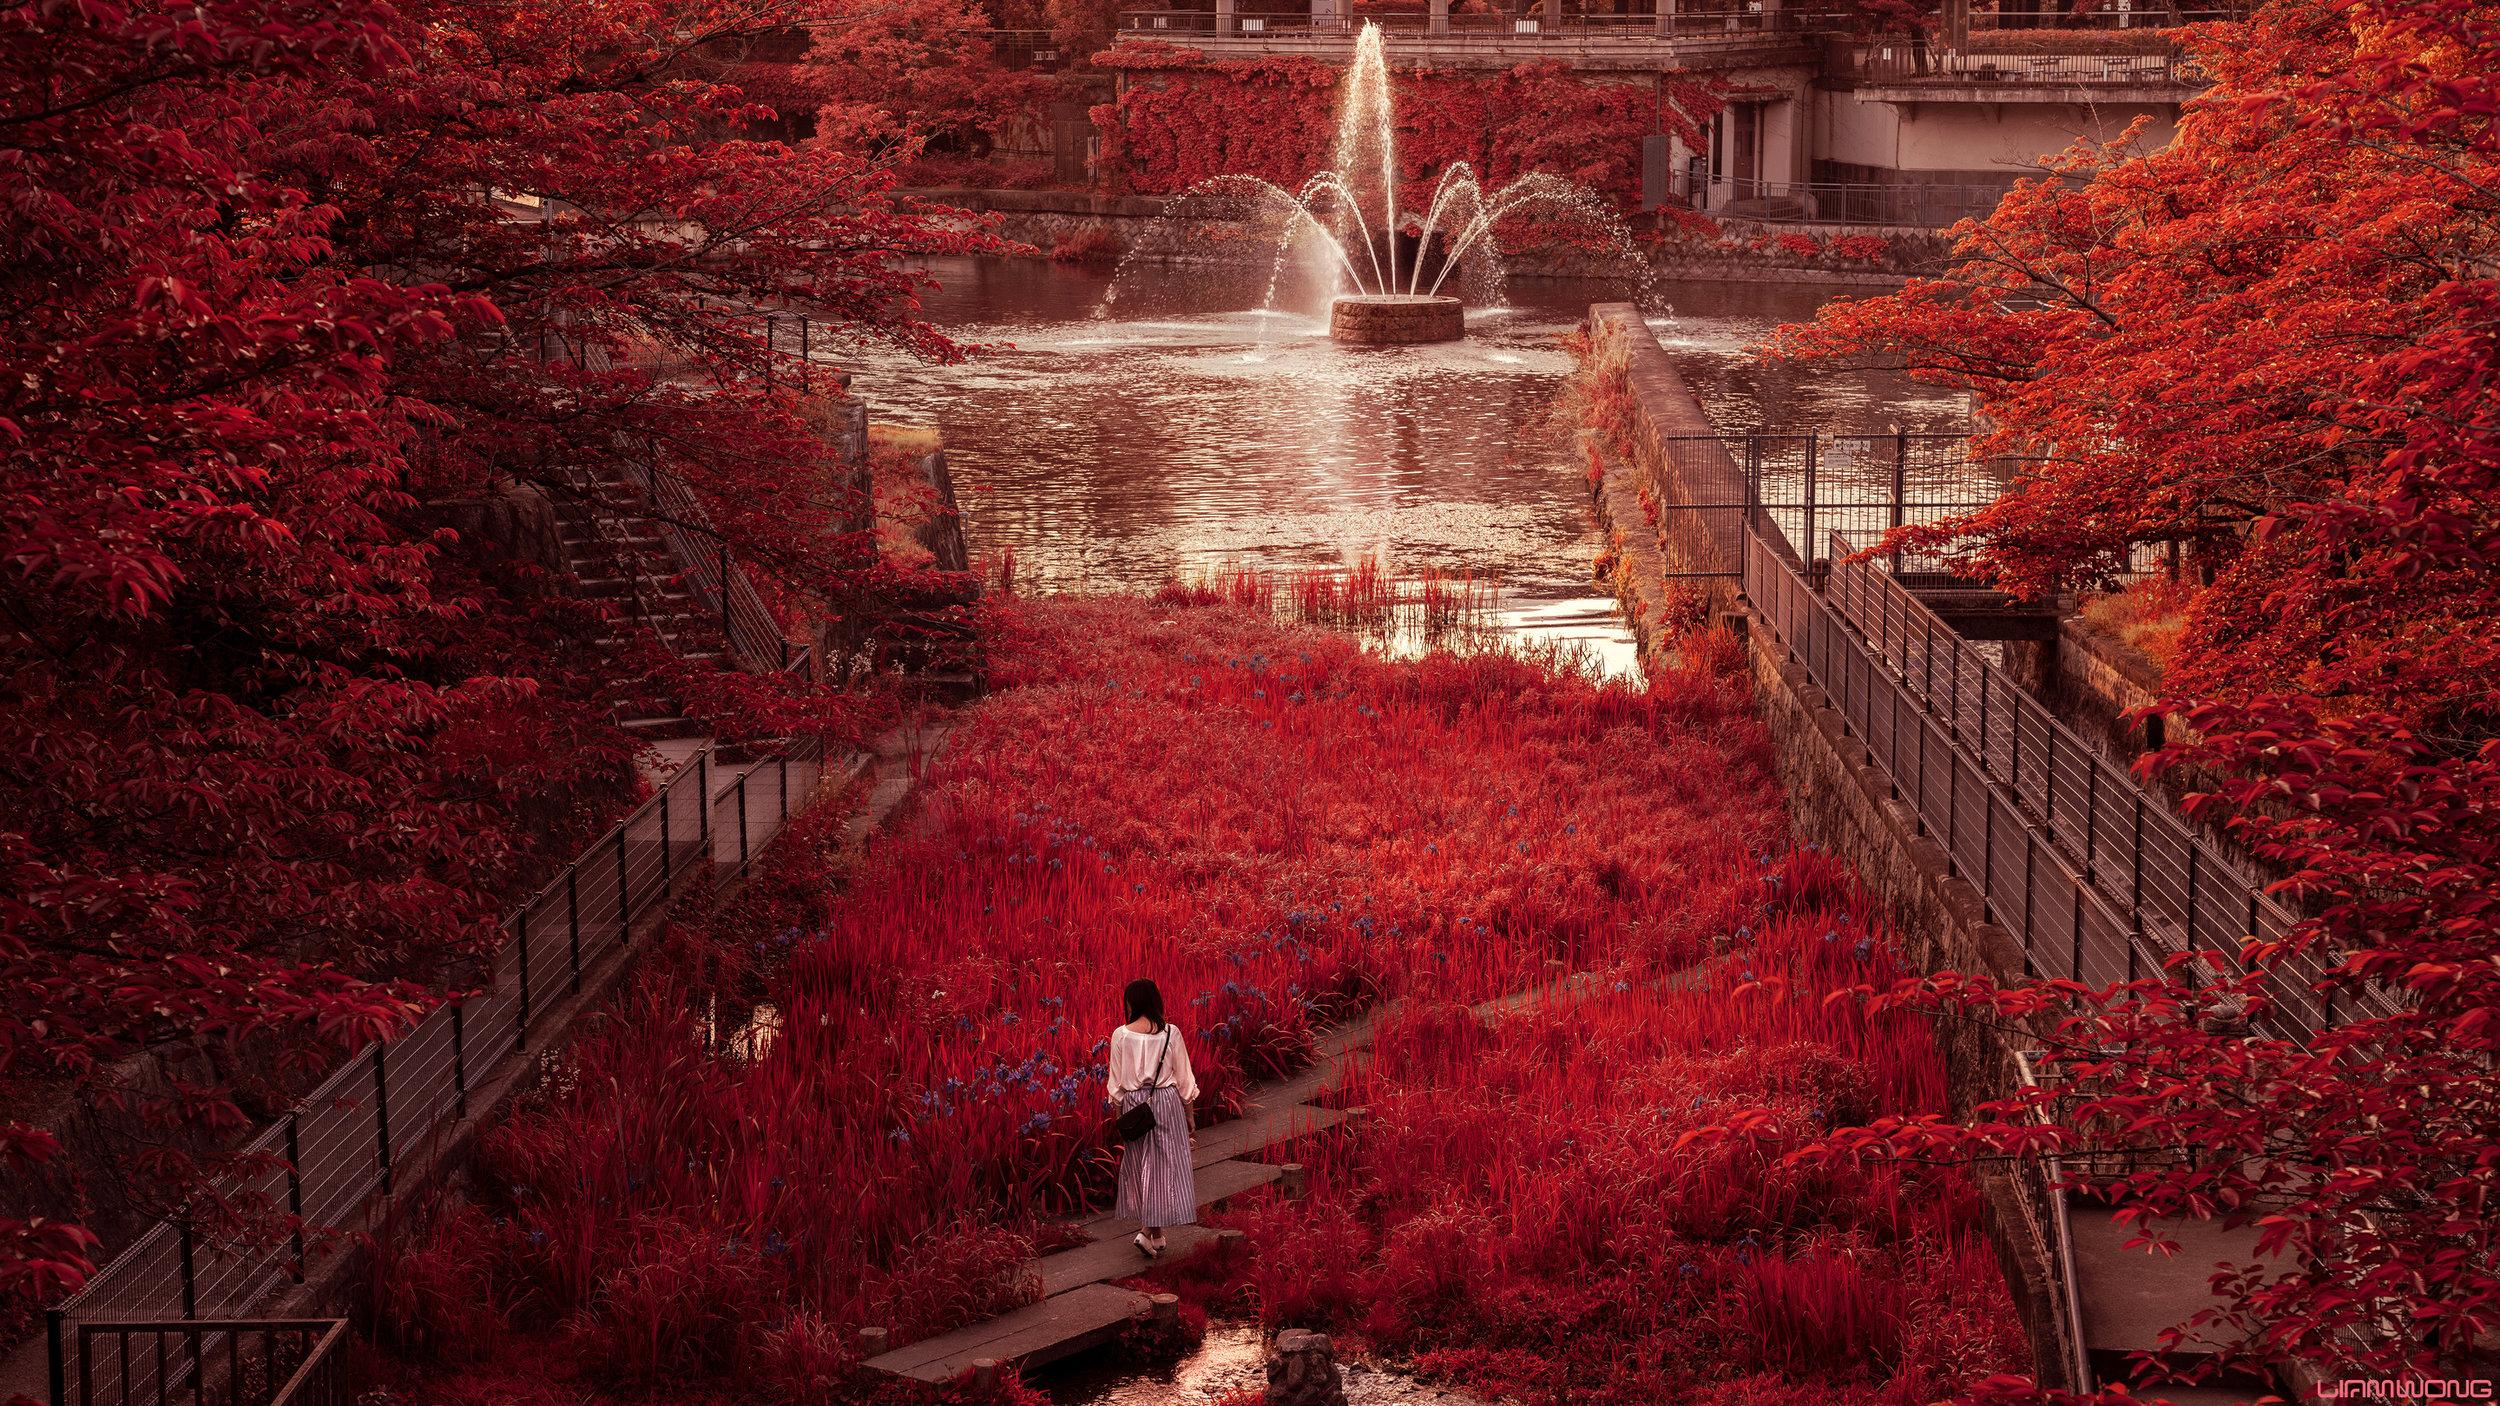 LiamWong_Mornings_In_Kyoto_RedArtboard+1+copy+3.jpg